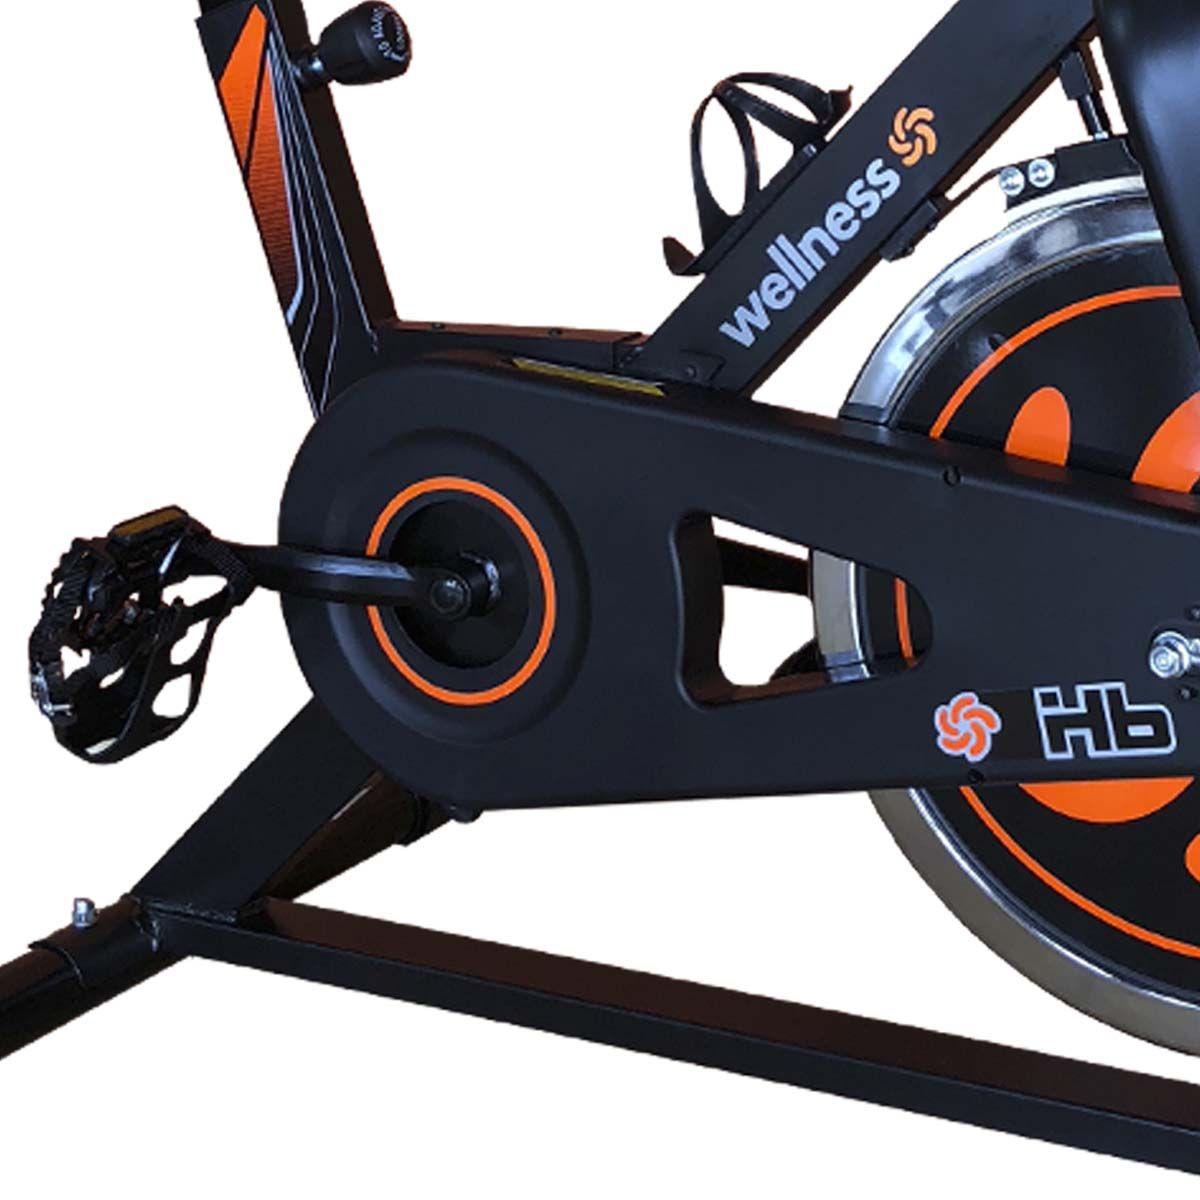 Bike Spinning Wellness Hb Residêncial